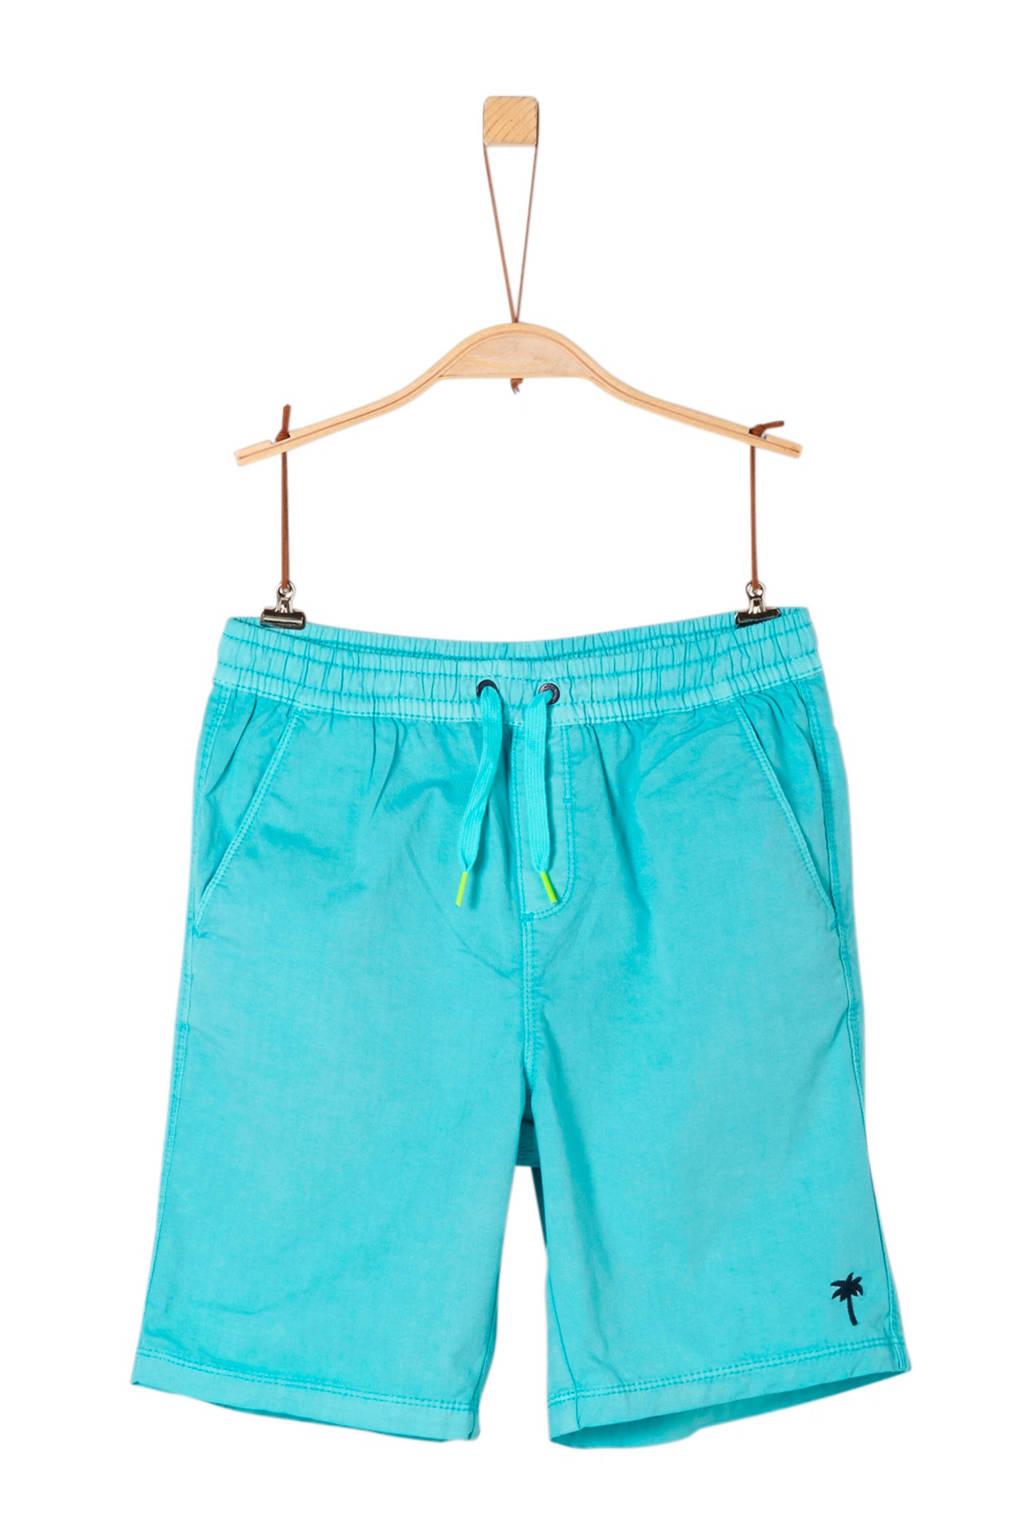 s.Oliver bermuda turquoise, Turquoise